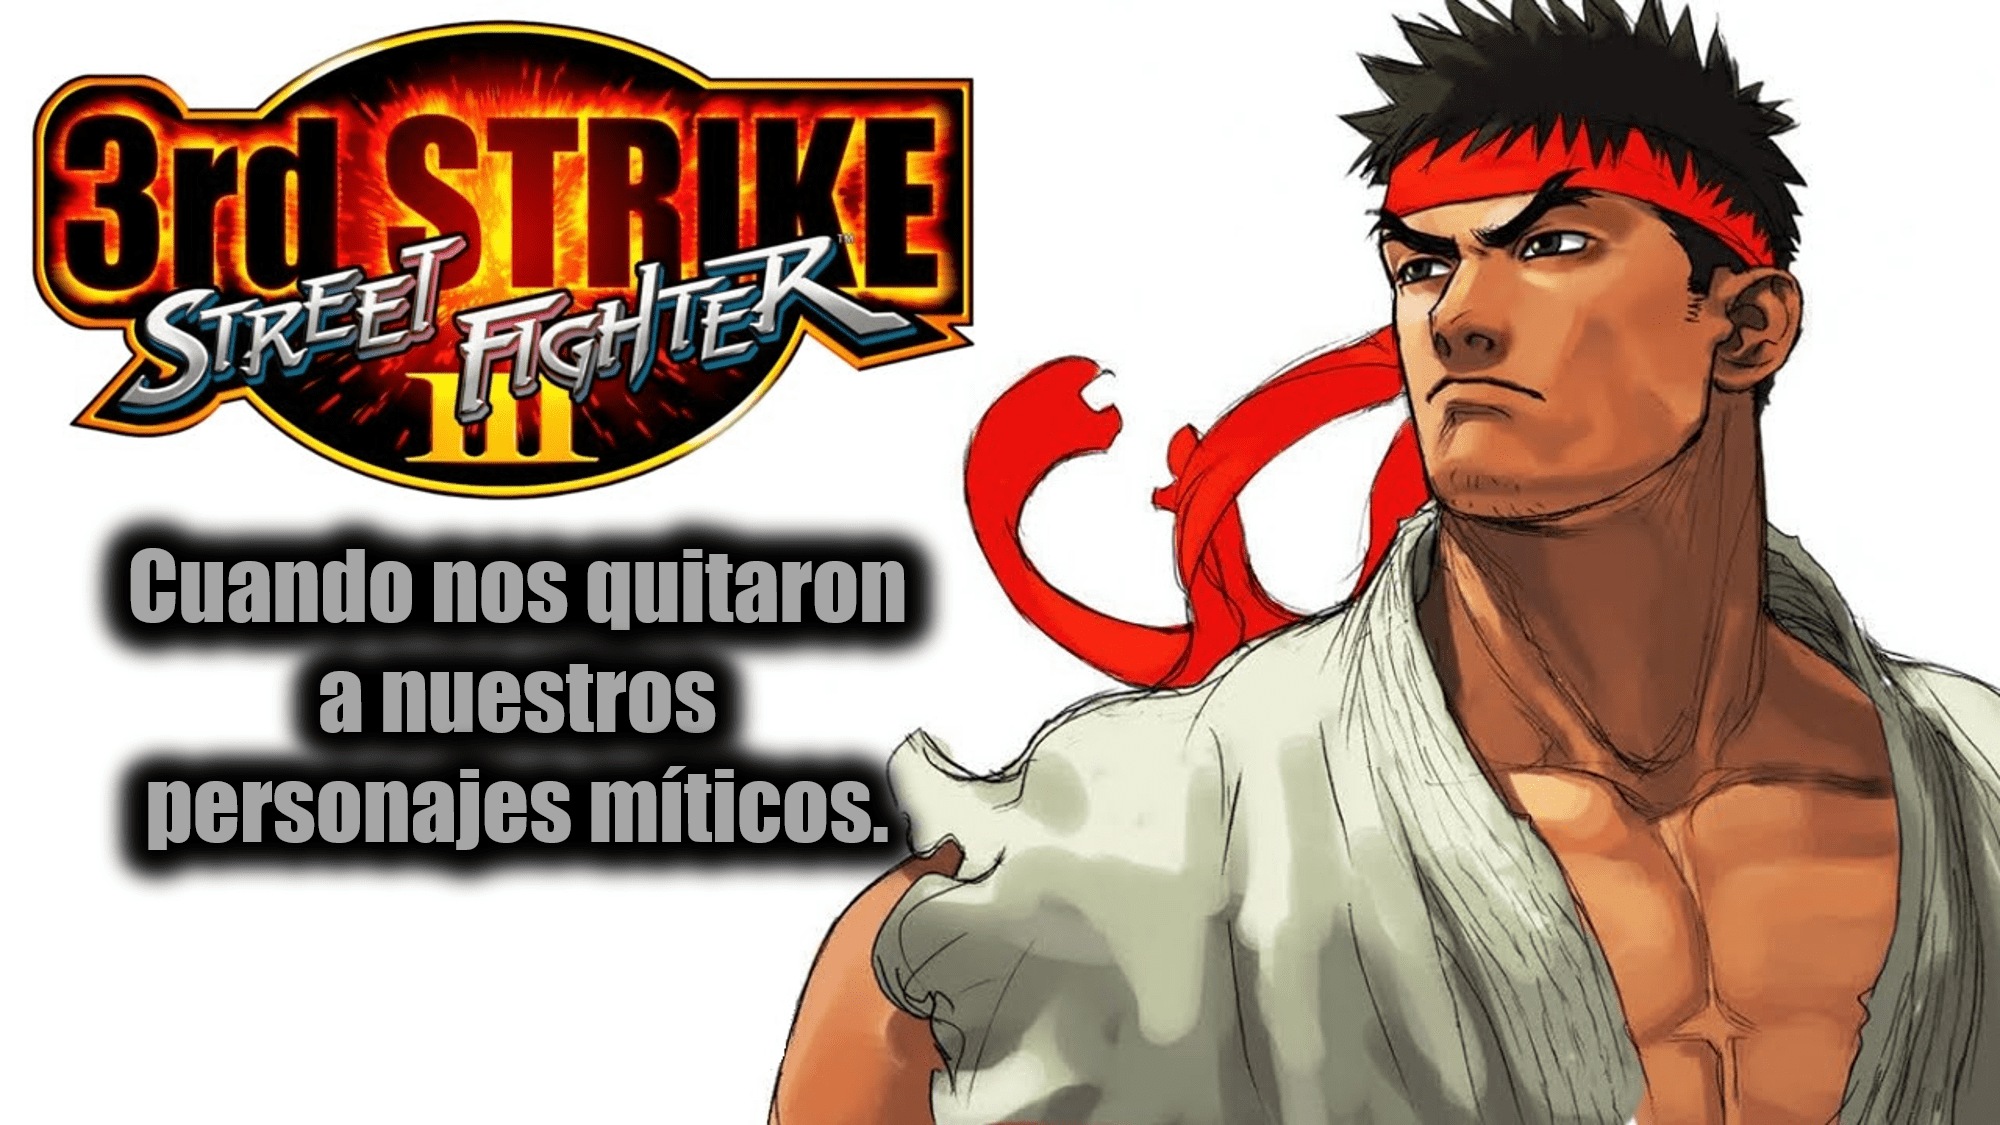 Street Fighter III New Generation